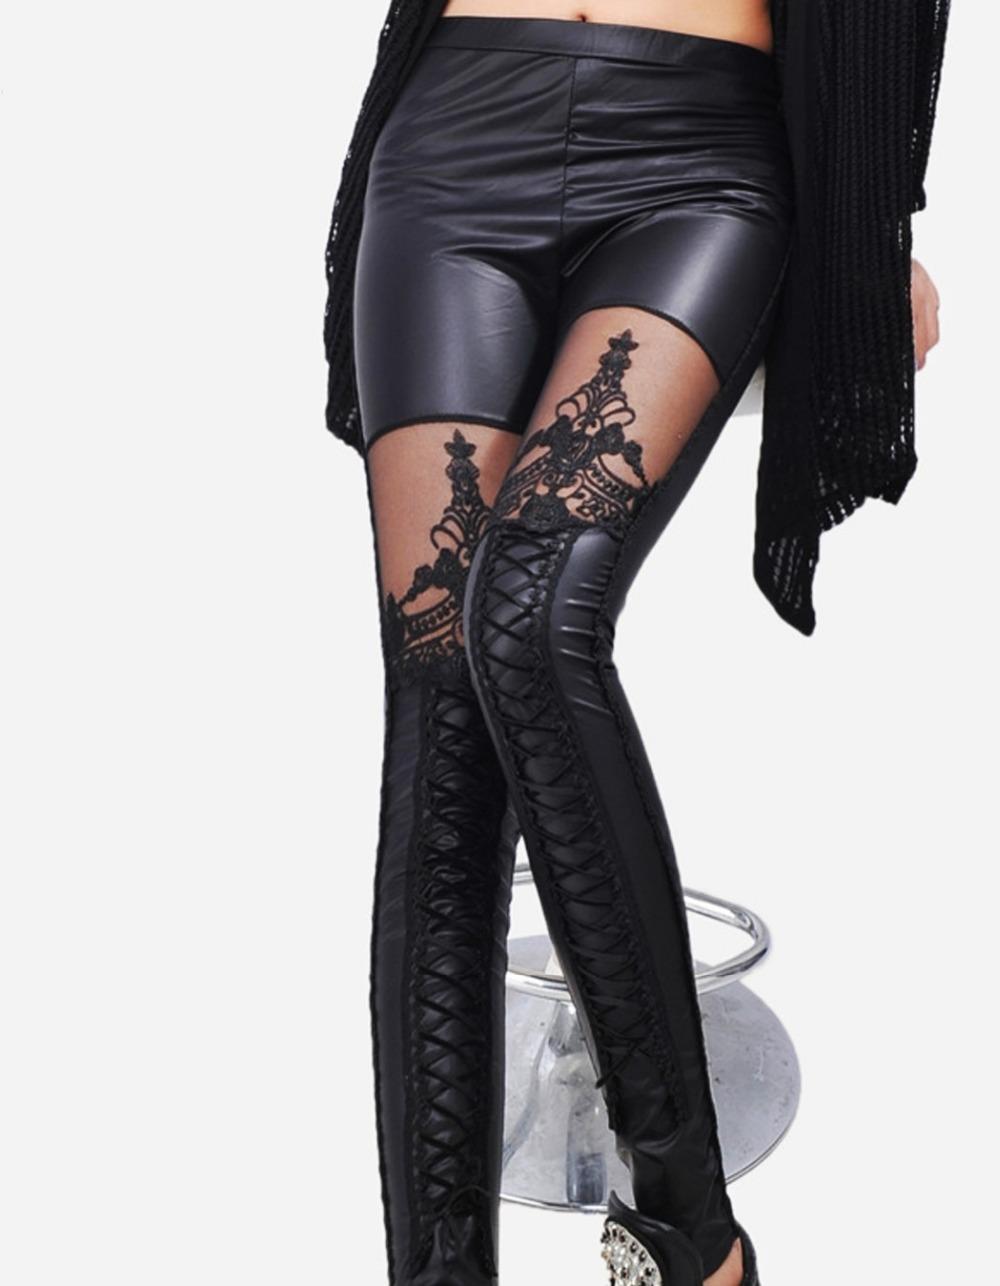 Black Legins Punk Gothic Fashion Women Leggings Sexy PU Leather Stitching Embroidery Hollow Lace Legging For Women Leggins 15 3